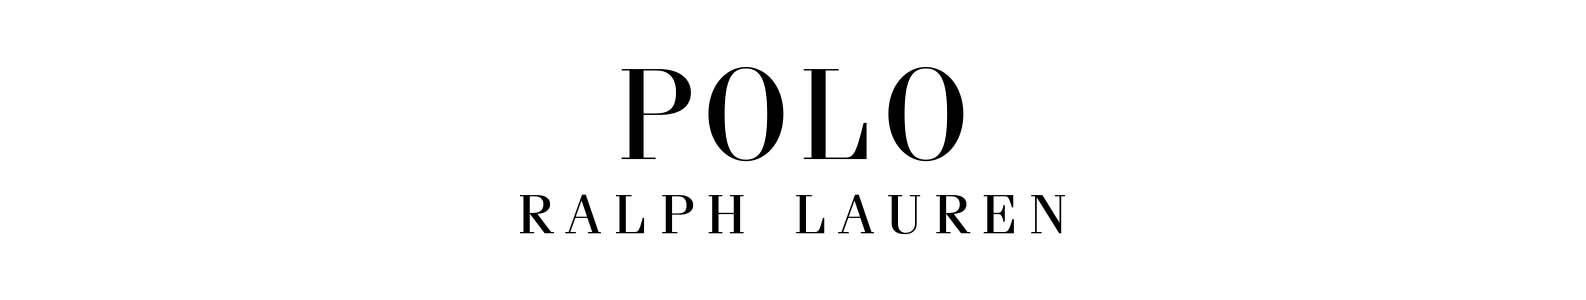 Polo Ralph Lauren brand header image